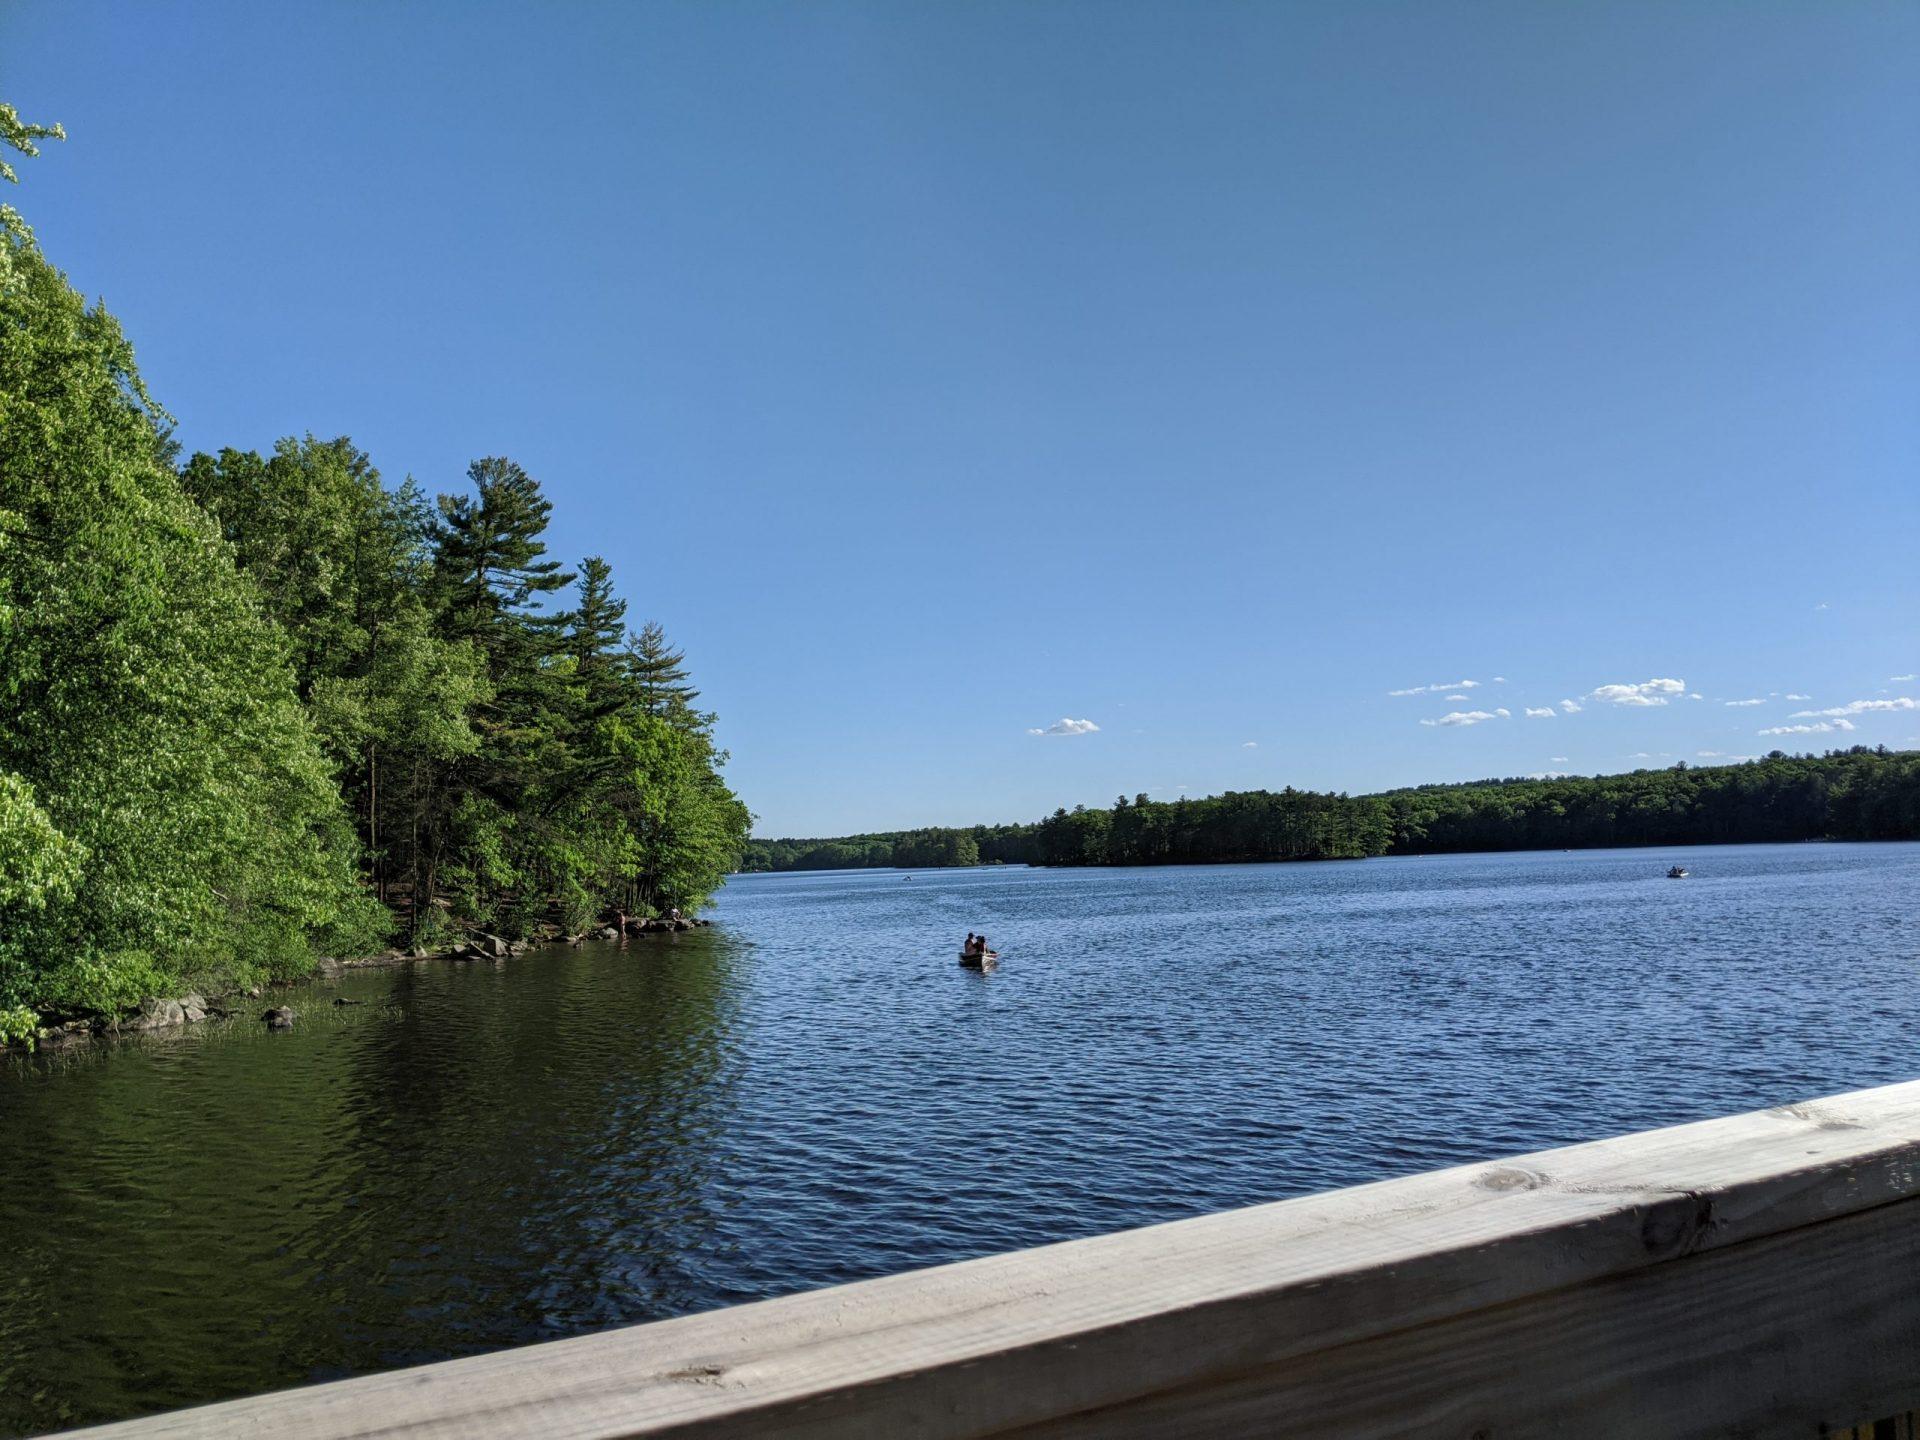 Canoes May 2020 - Ashland State Park